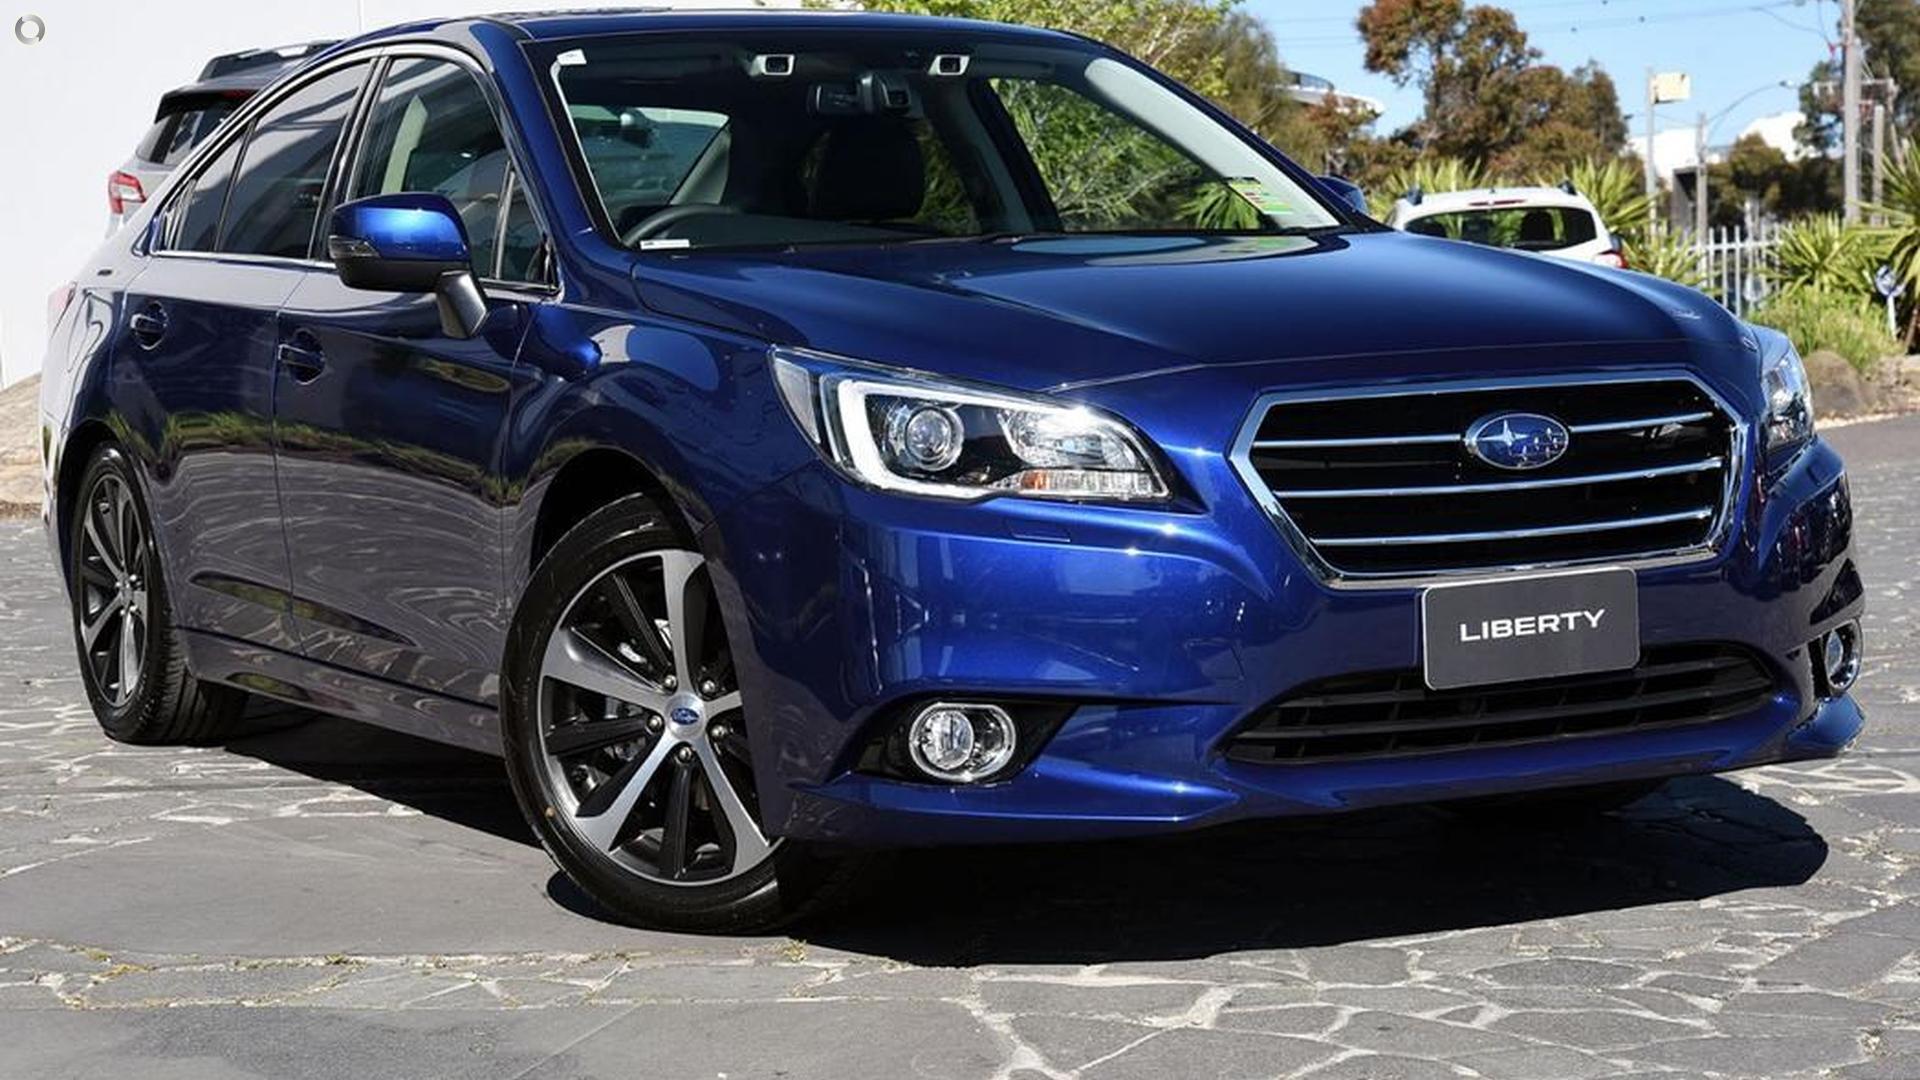 2017 Subaru Liberty 2.5i Premium